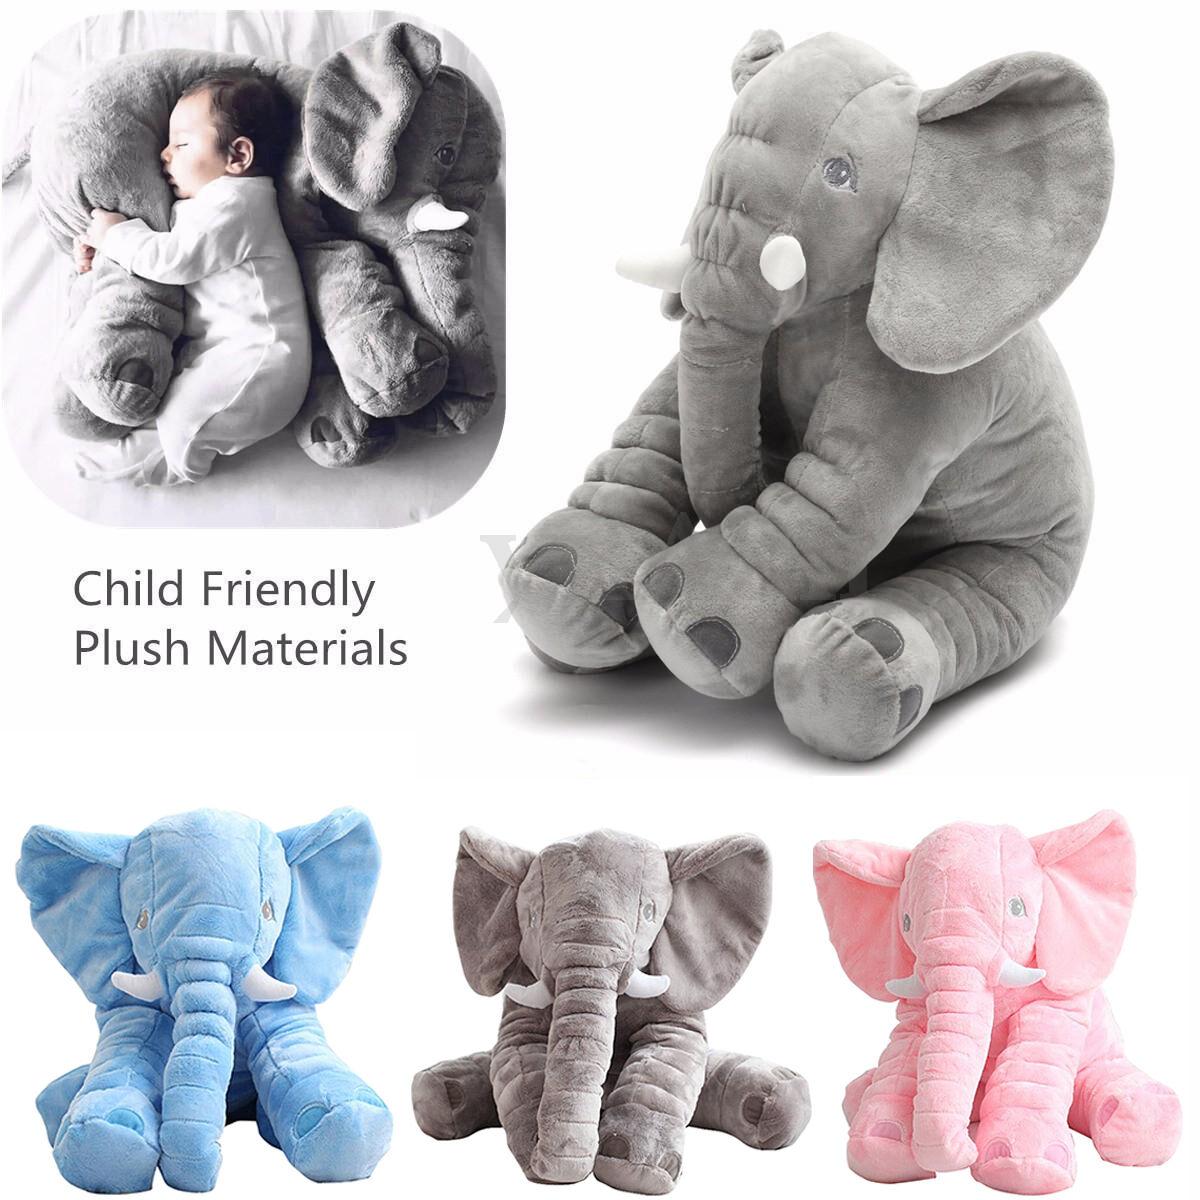 Kinder Baby Elefant Kissen Stofftier Kuscheltier Spielzeug Pillow Geschenk DE TW